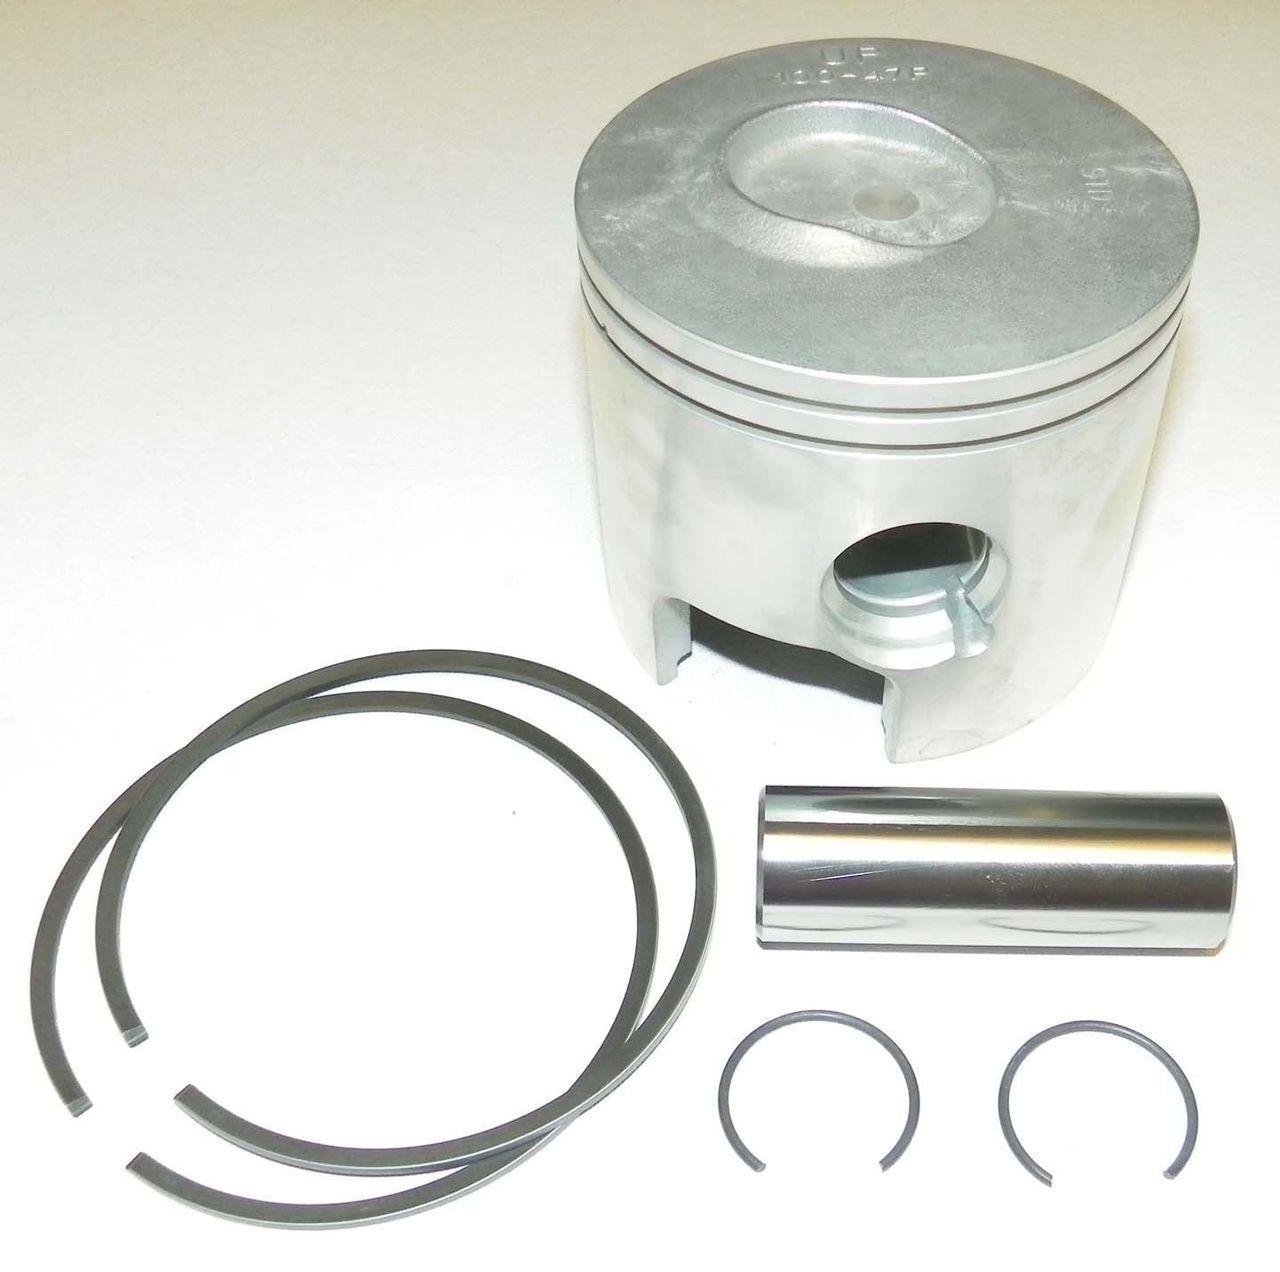 Wsm Mercury 200 250 Hp 3 6265 Bore Optimax Piston Kit Oe 881054t3 881054t10 100 47 881054t3 881054t10 Seadoo Pistons Mercury